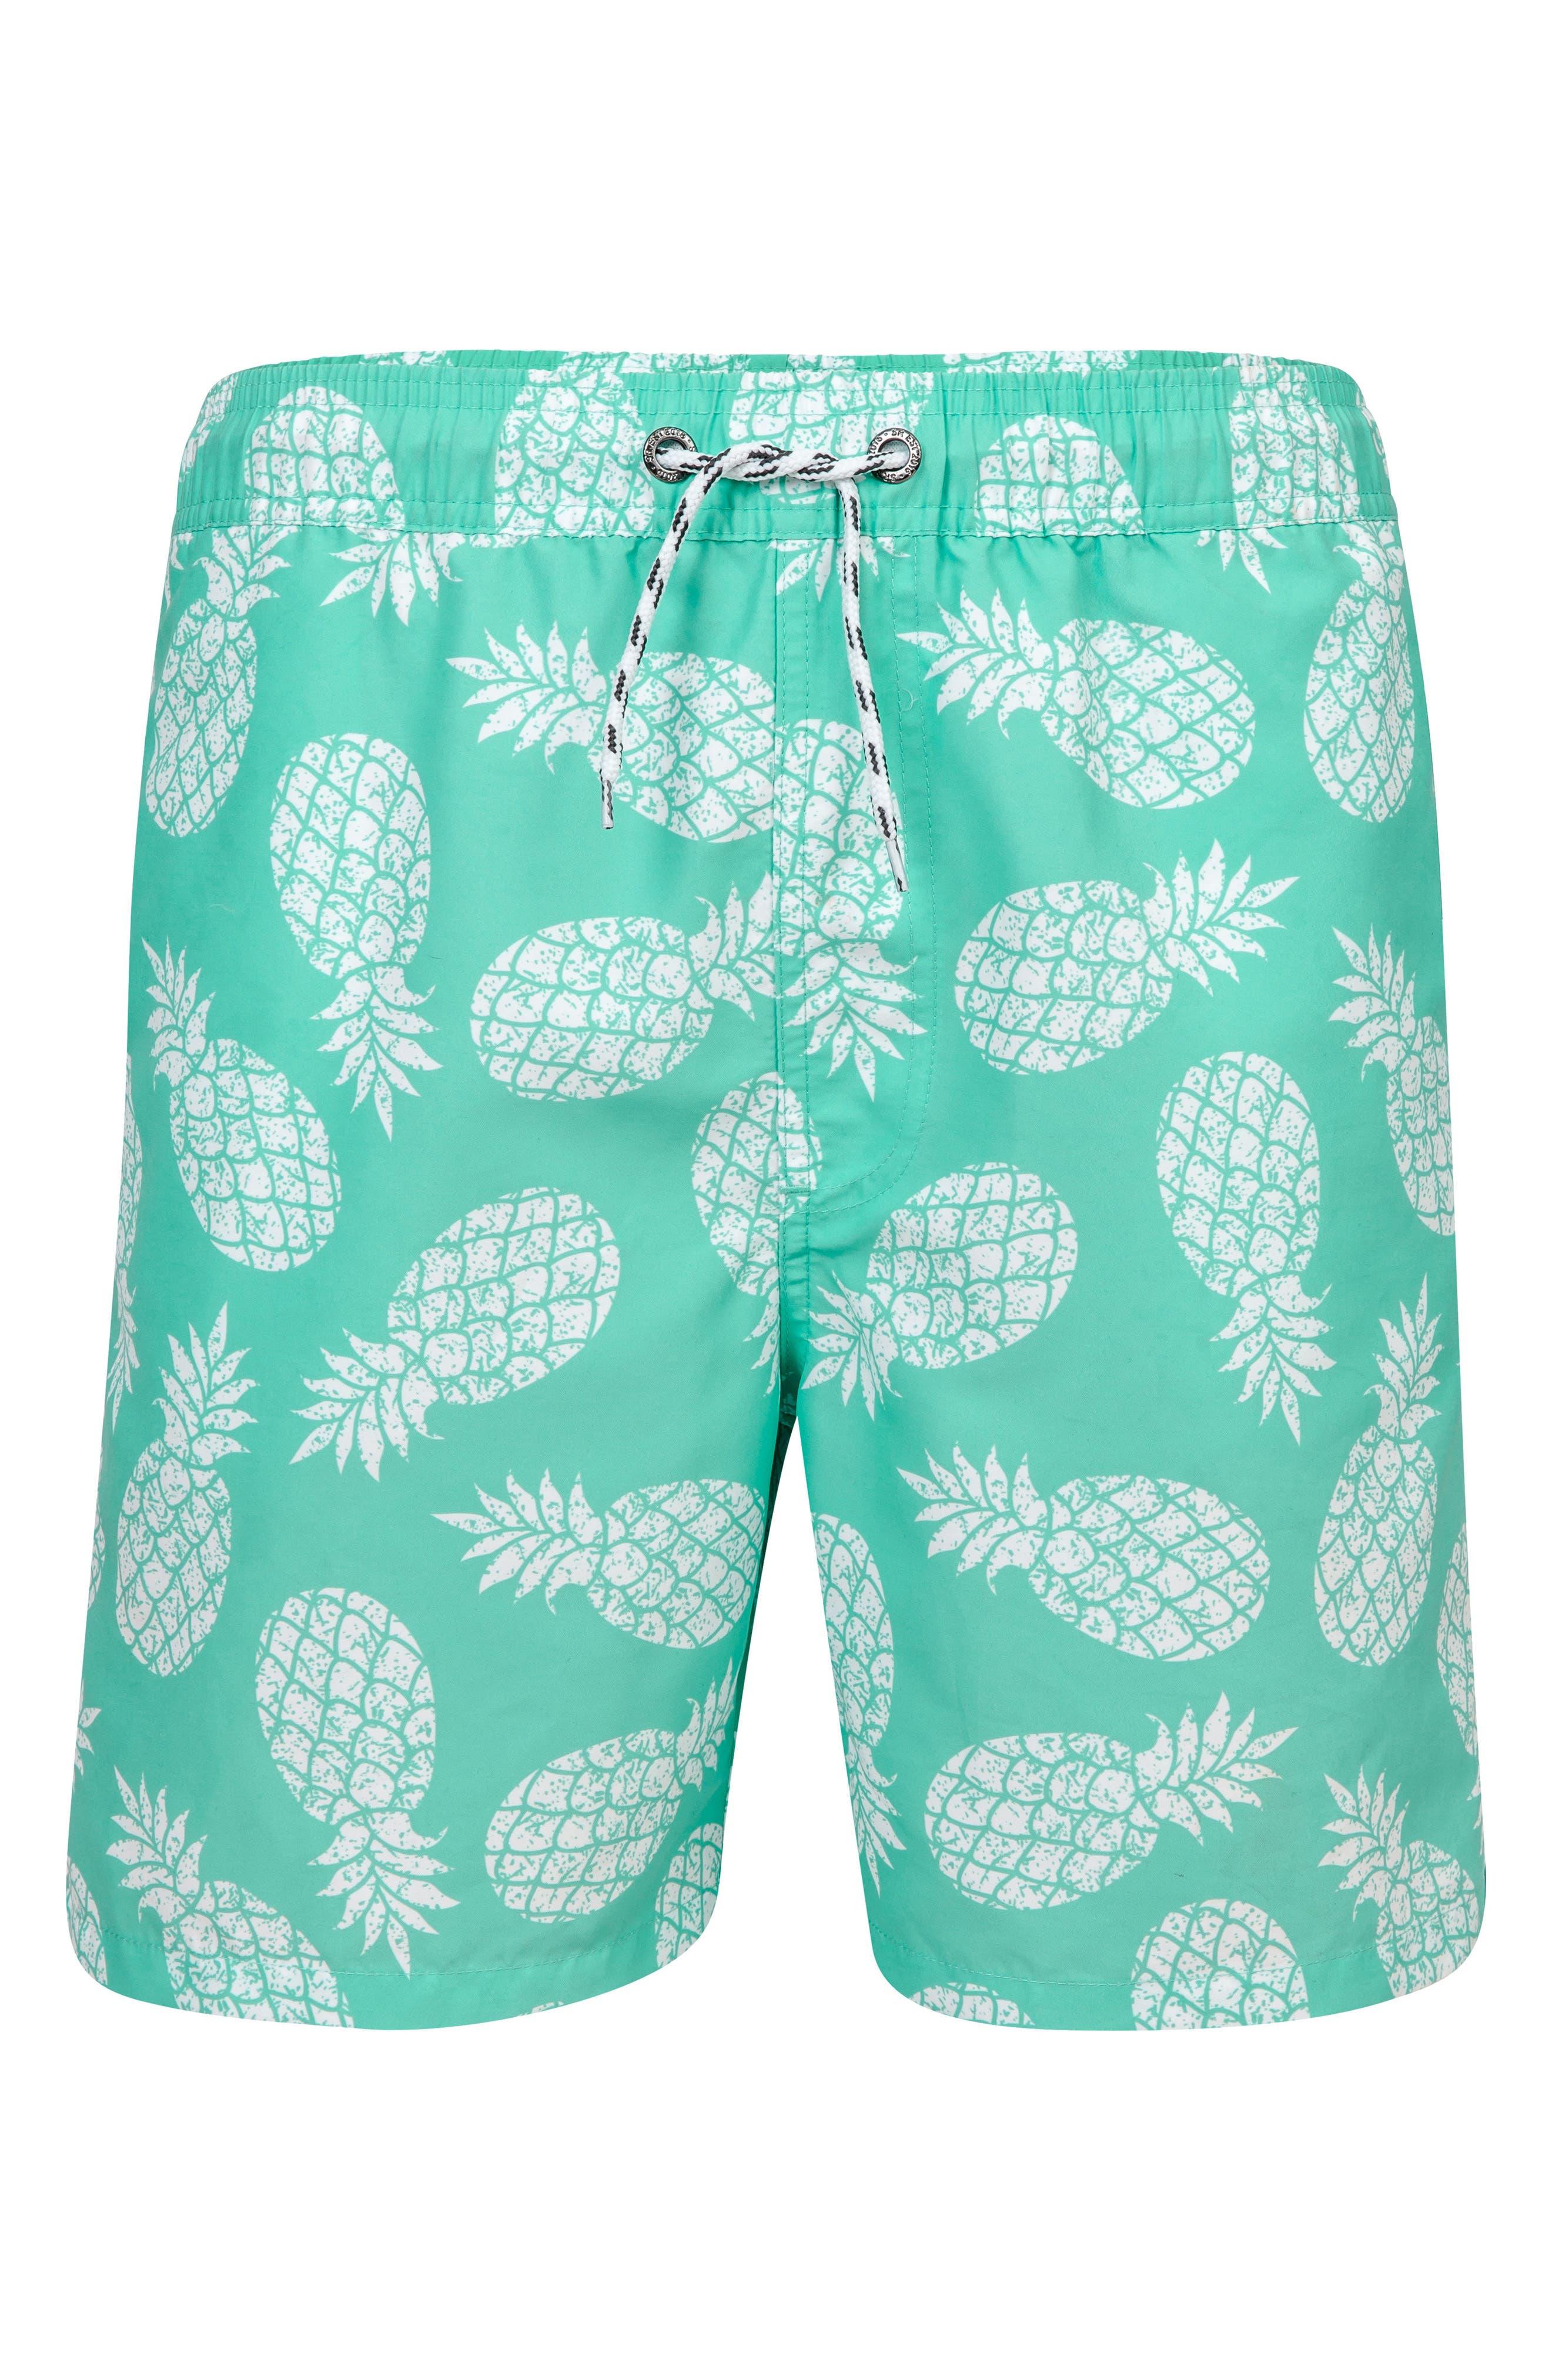 Pineapples Board Shorts,                             Main thumbnail 1, color,                             Mint/ White